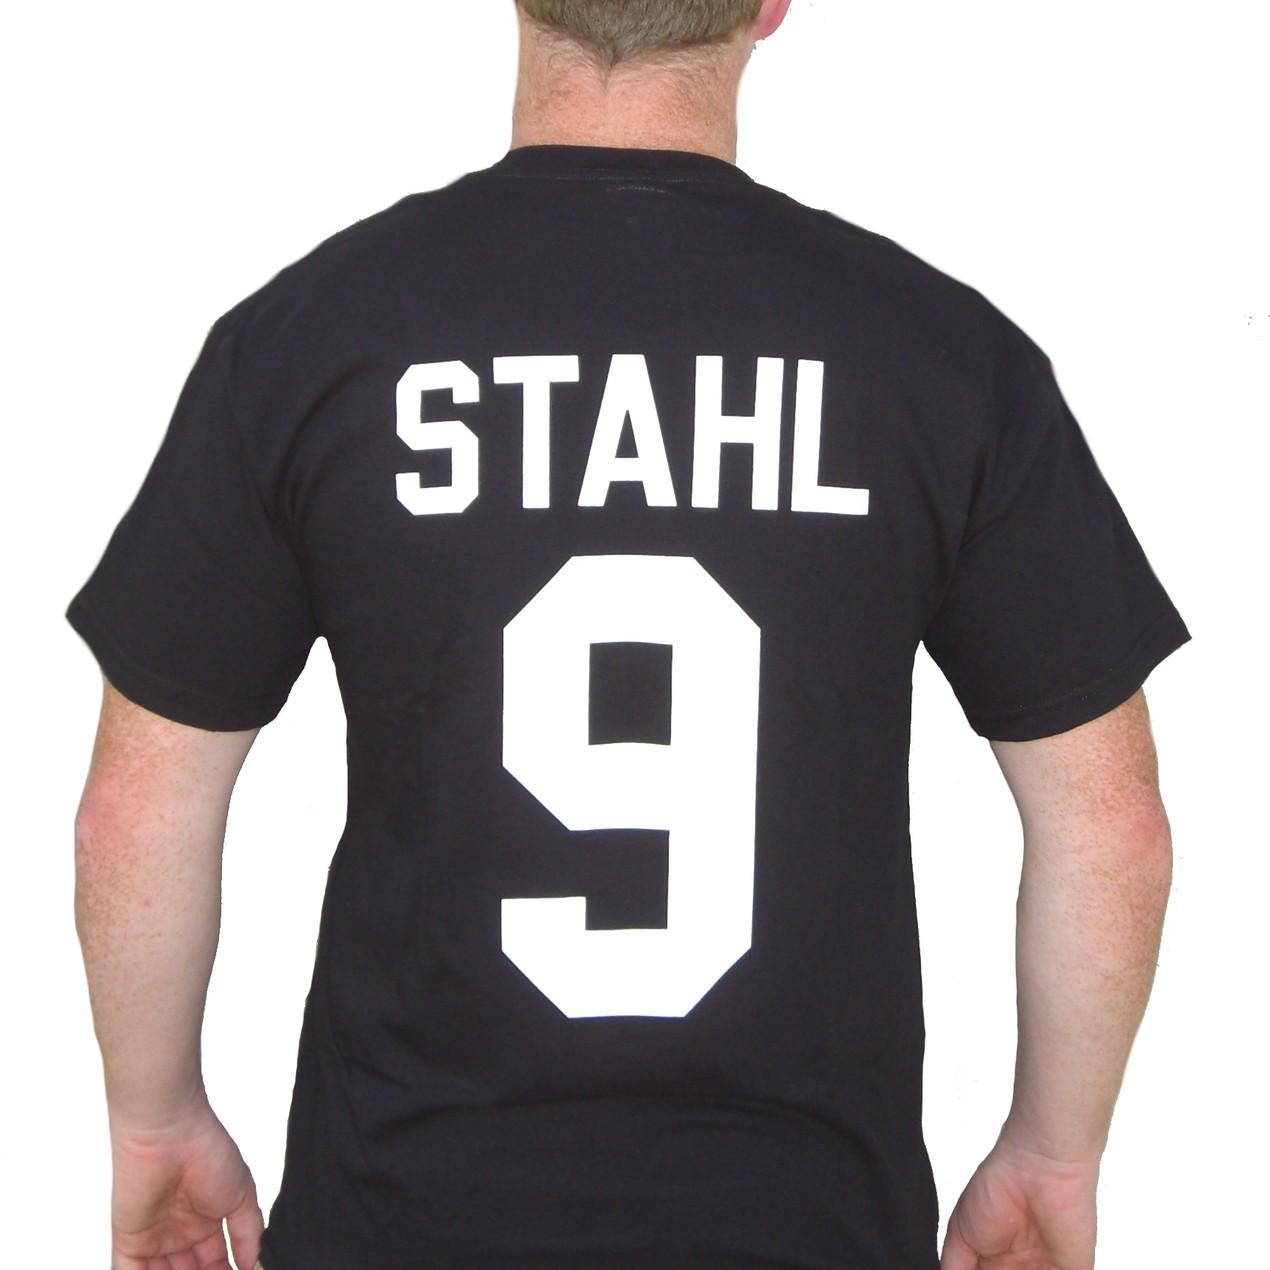 733b6f7aa Gunnar Stahl #9 Iceland Jersey T-Shirt - Tanga